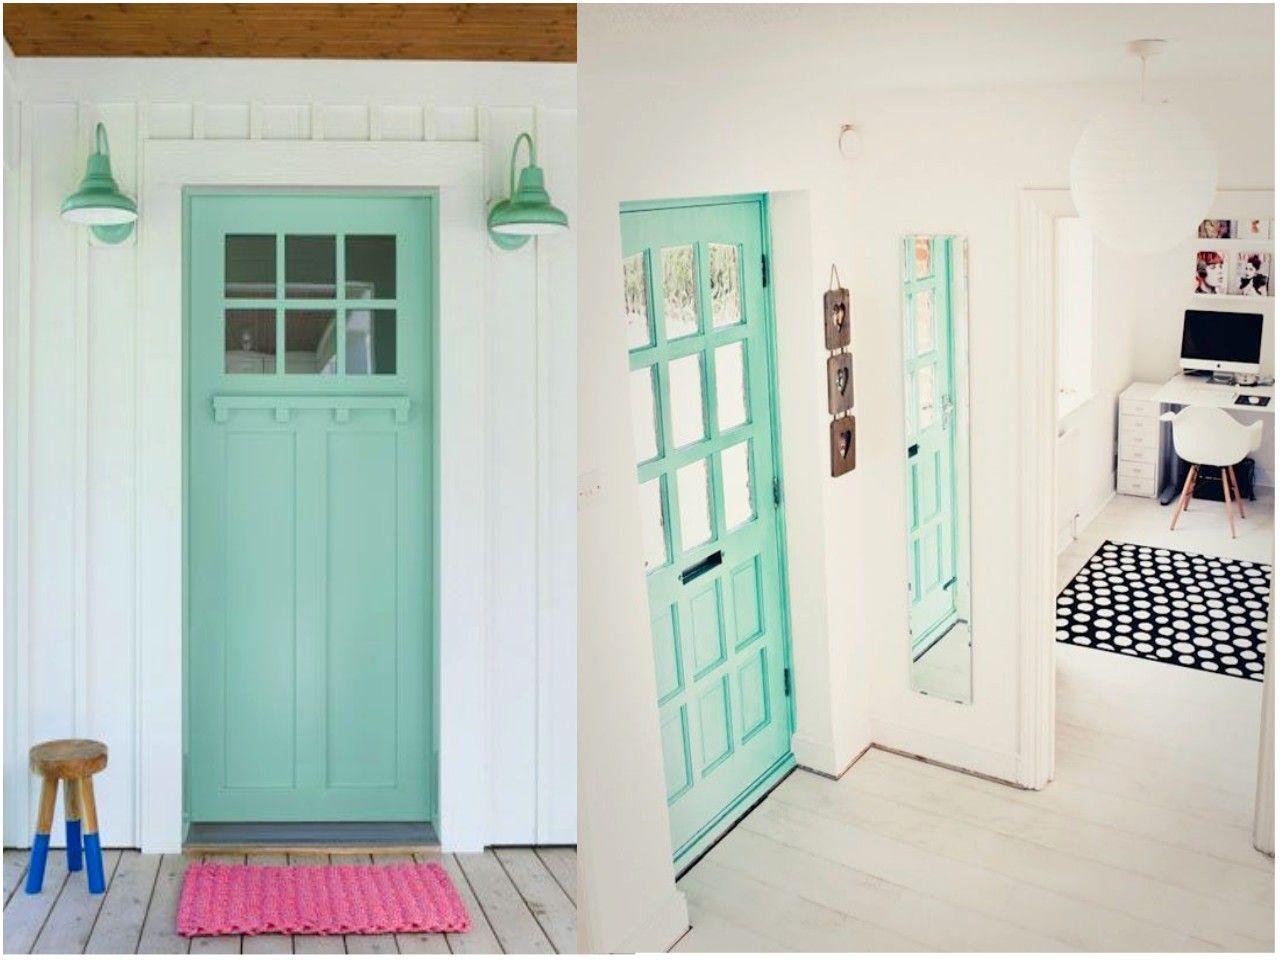 C mo pintar las puertas de casa ideas e inspiraci n puertas pintadas puerta de entrada y - Pintar puertas de casa ...